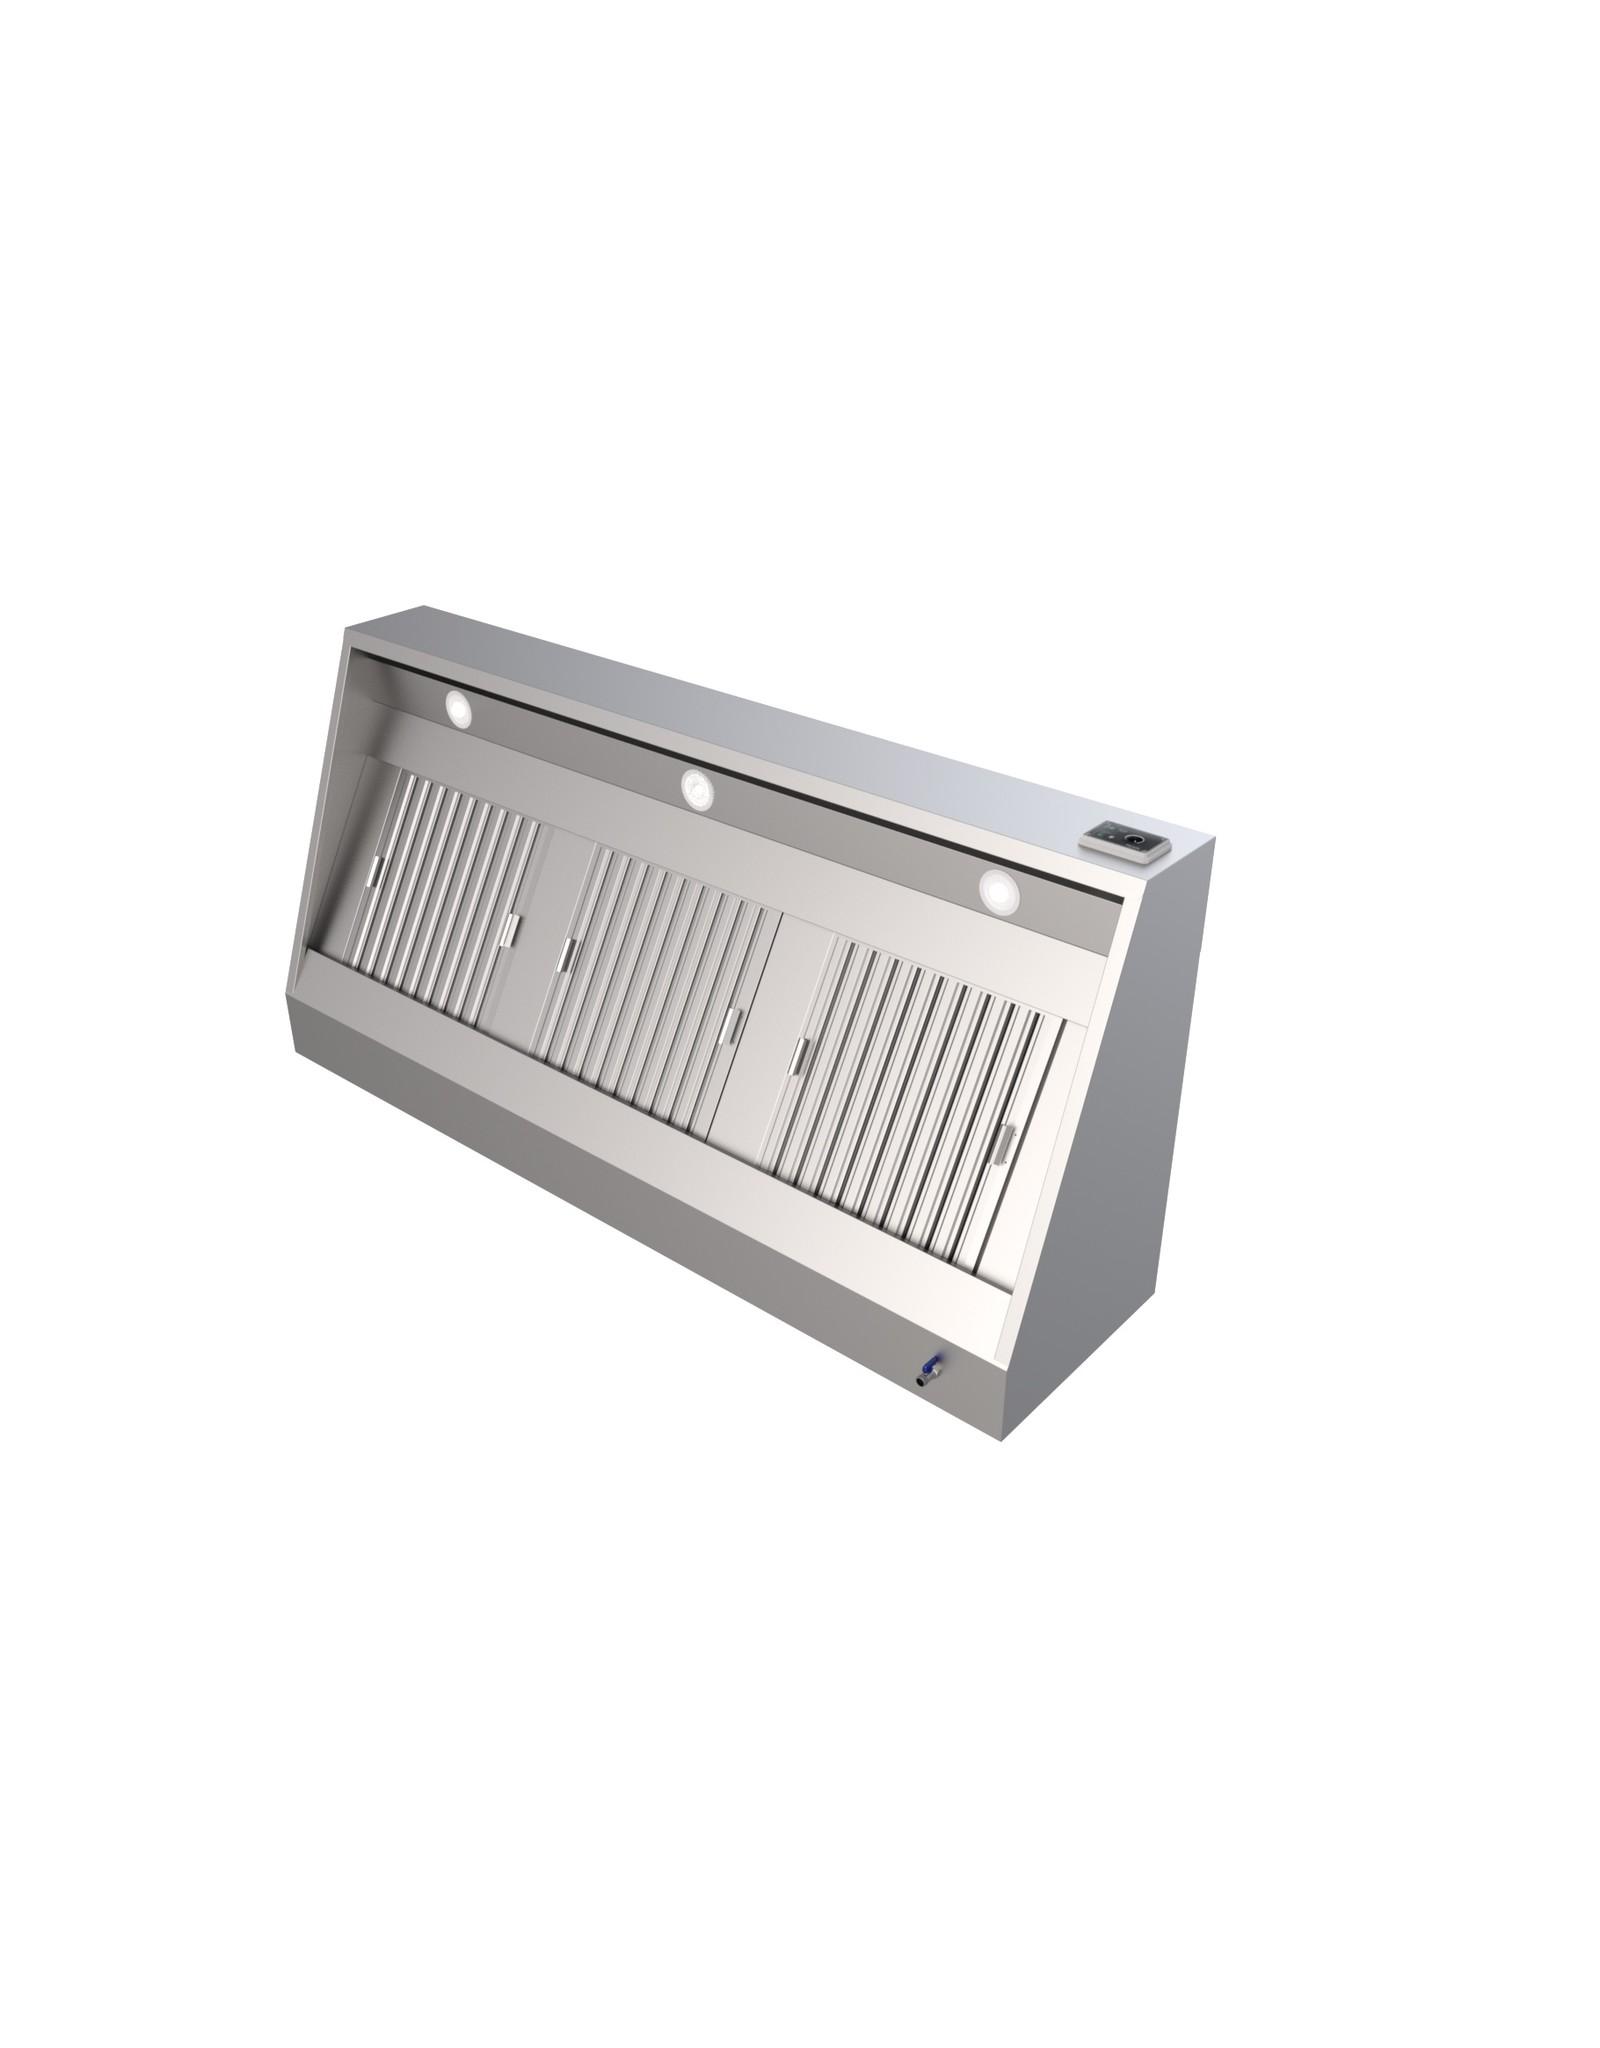 Q-Gastro RVS Afzuigkap NIEUW!! Verlichting+filter 200x70x45